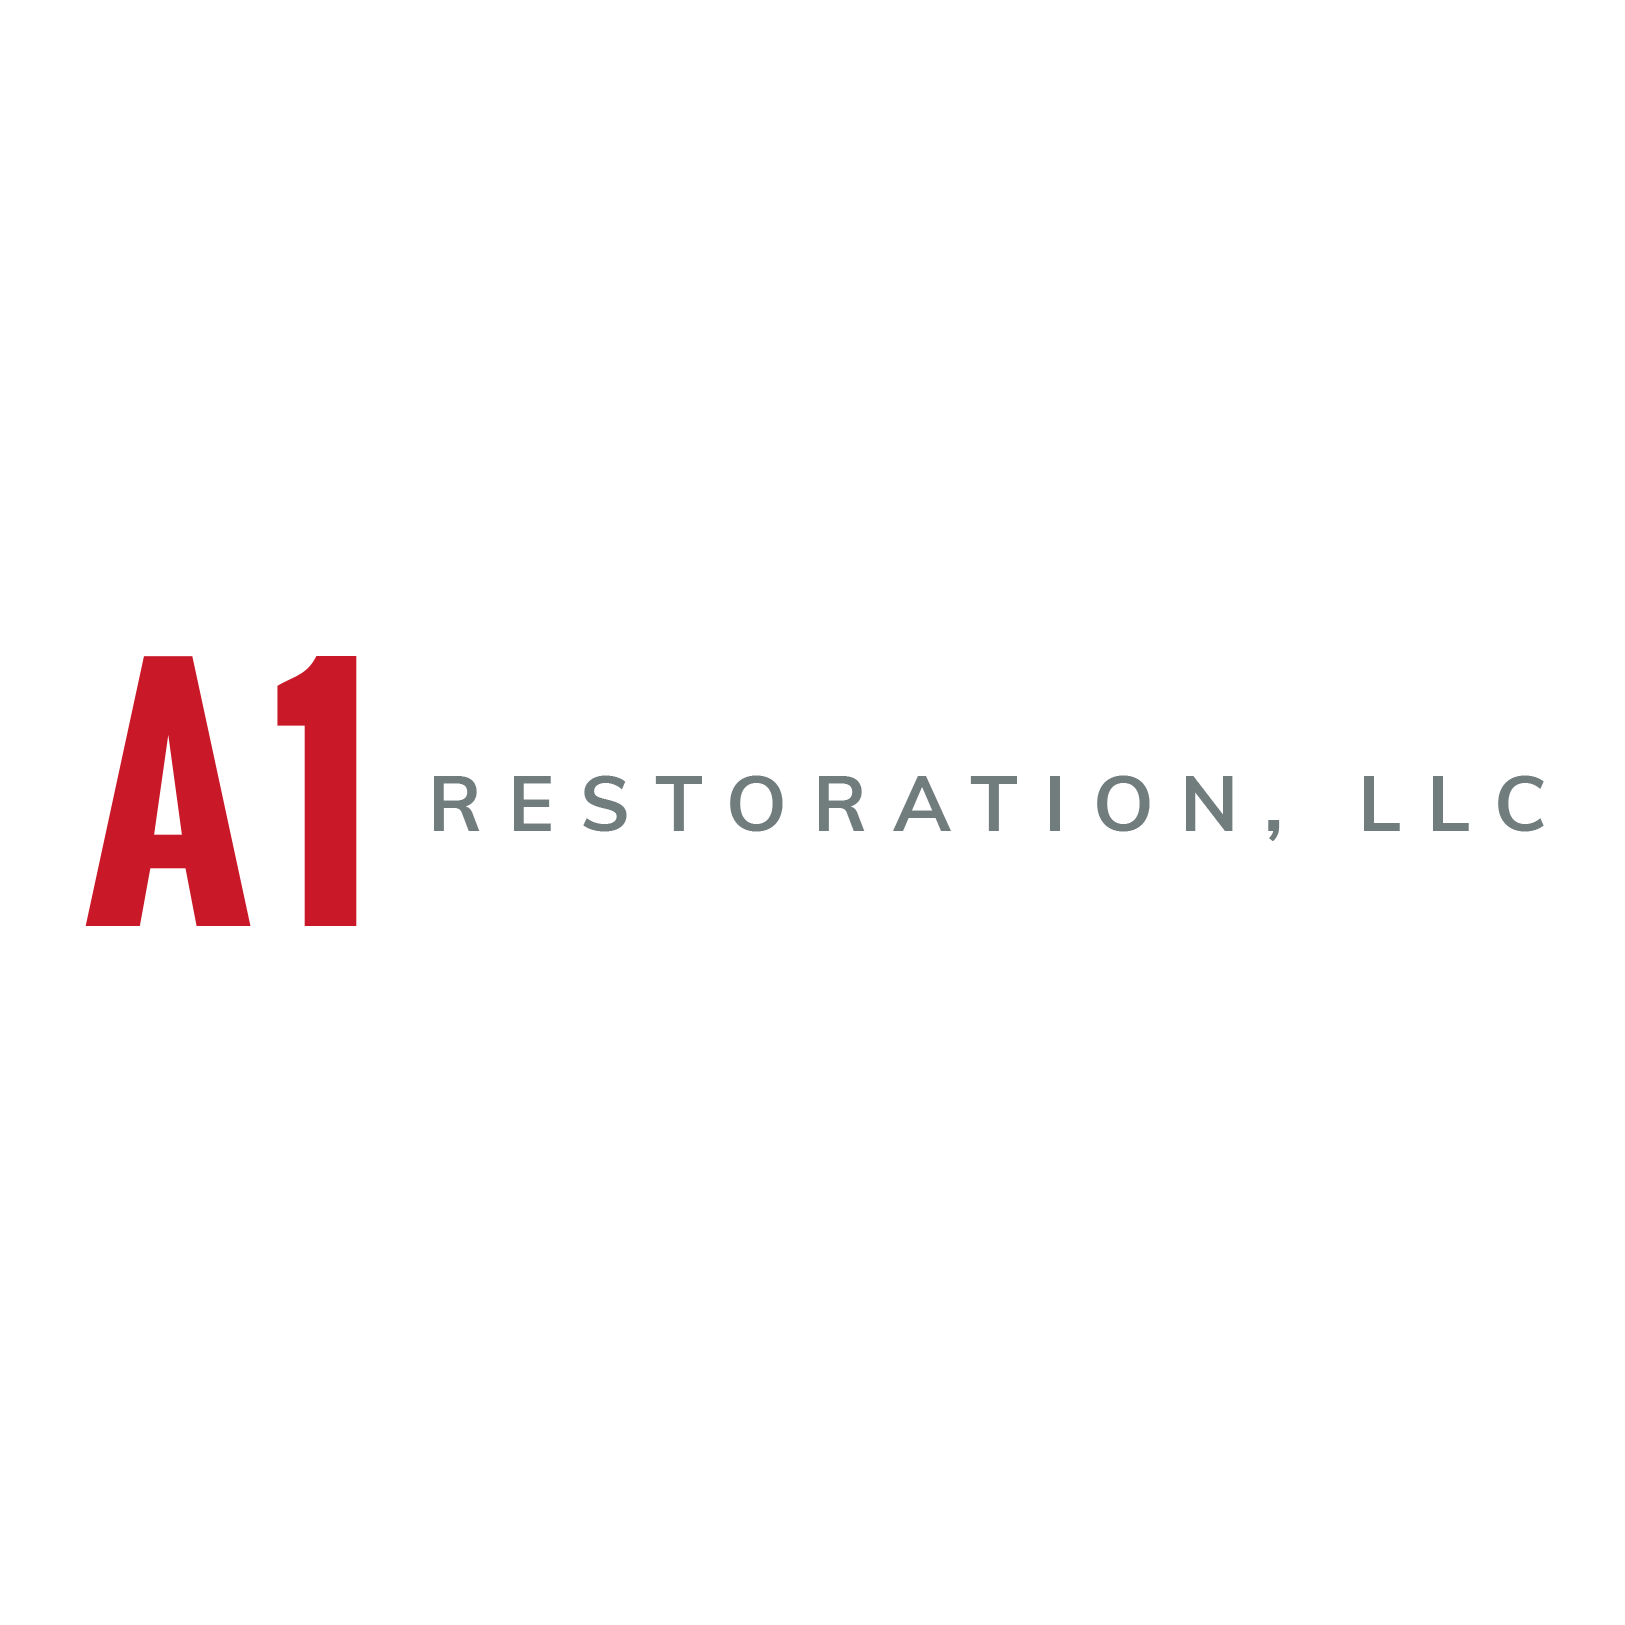 A1 Restoration, LLC